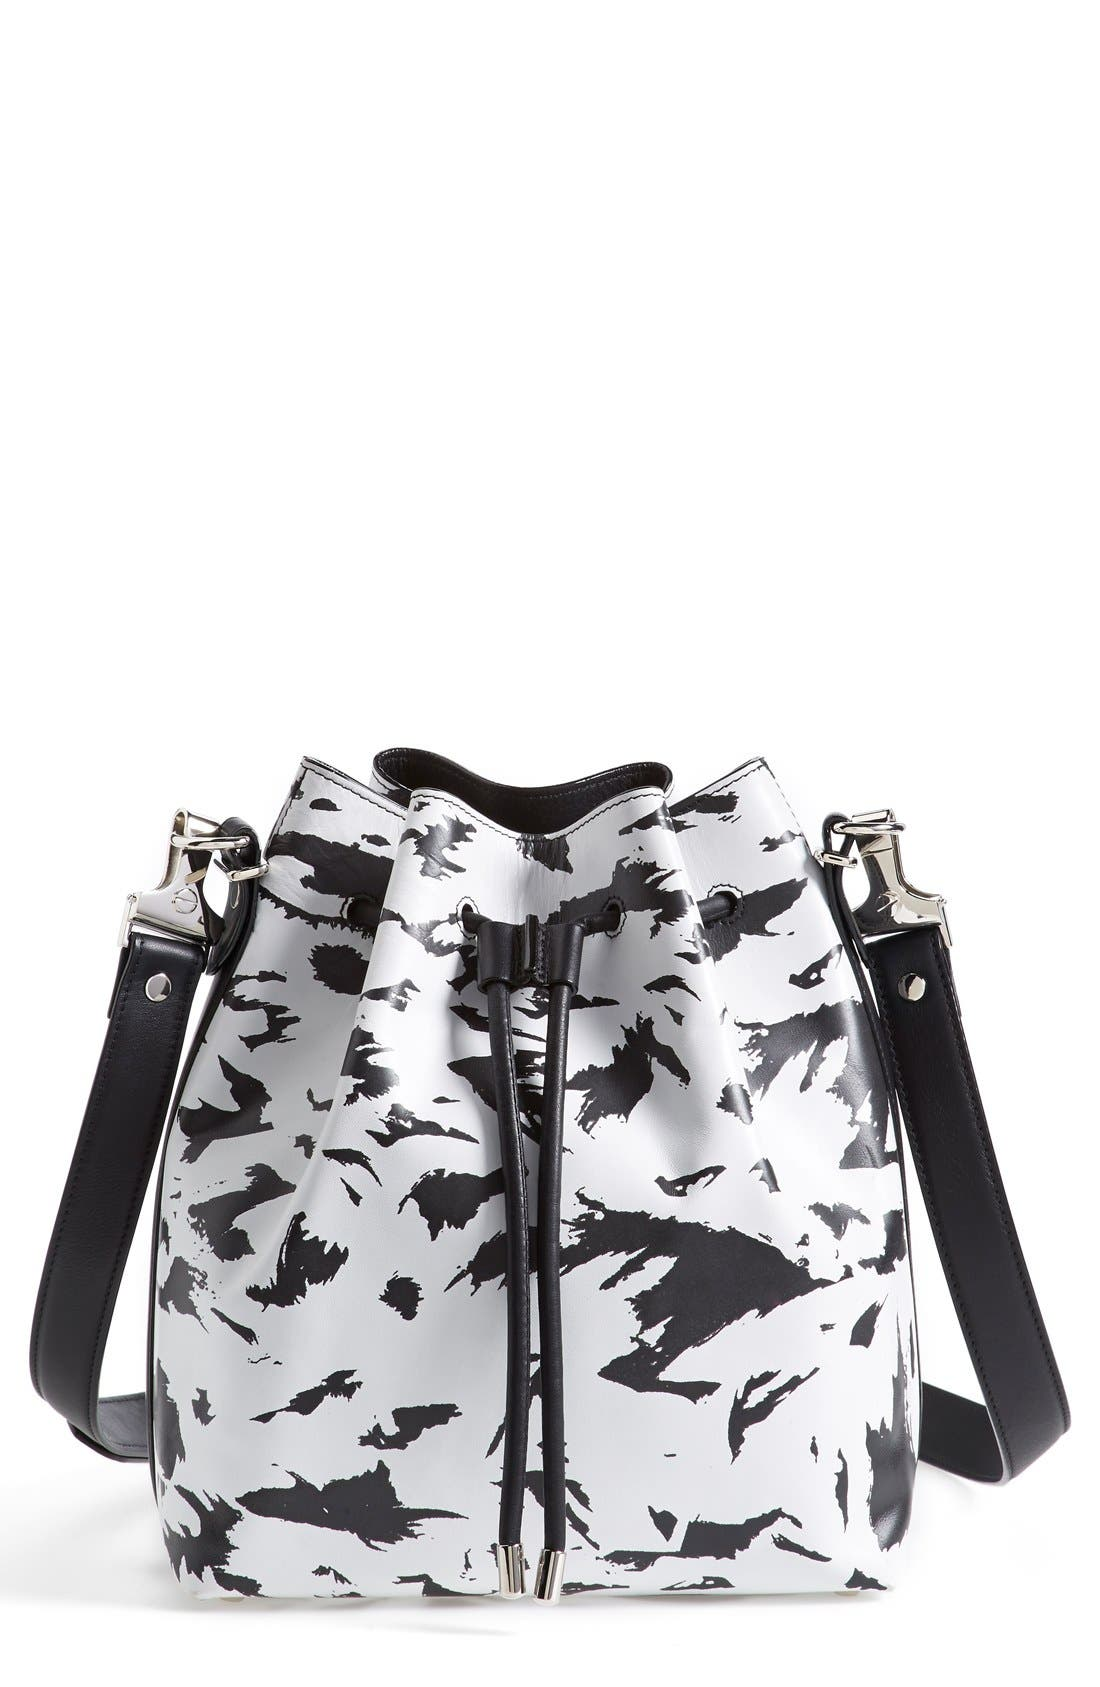 Alternate Image 1 Selected - Proenza Schouler 'Medium' Feather Print Leather Bucket Bag